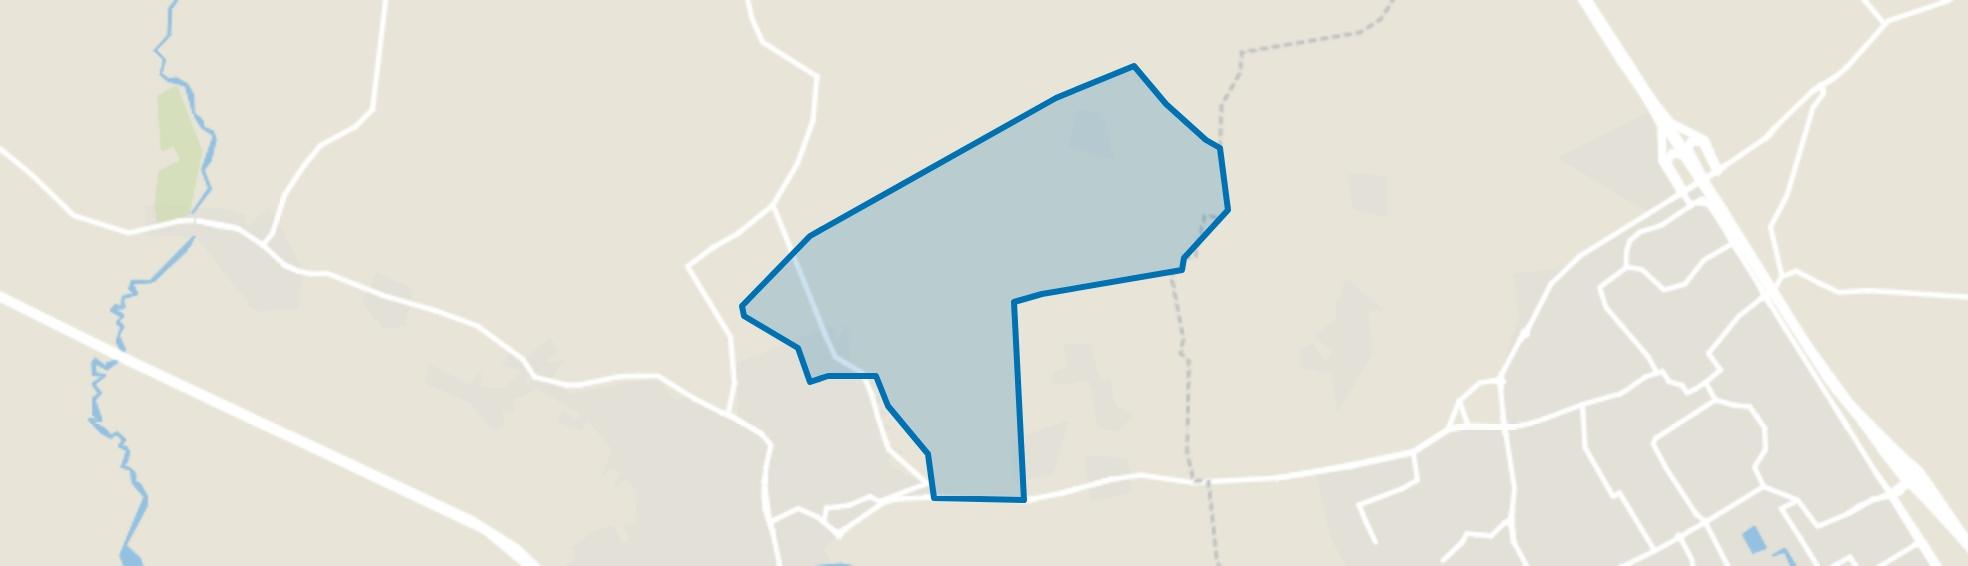 Snepseind en Bijsterveld, Oirschot map